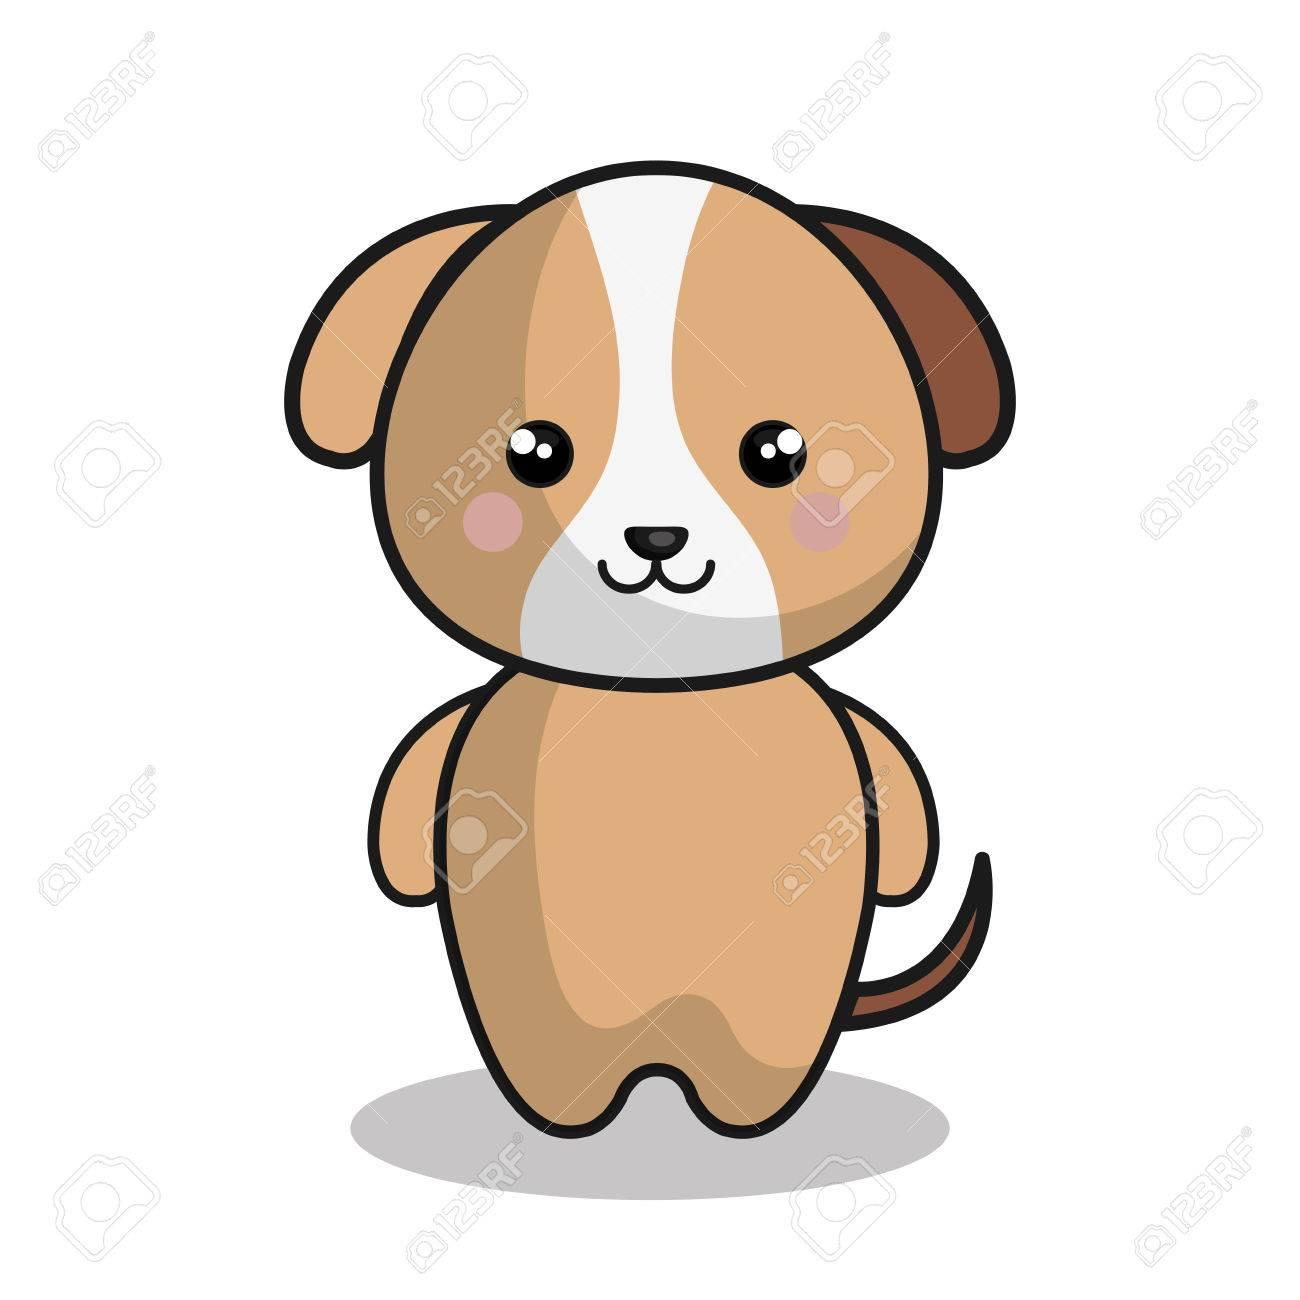 Beautiful Bear Brown Adorable Dog - 72505180-cute-dog-kawaii-style-vector-illustration-design  Snapshot_7717100  .jpg